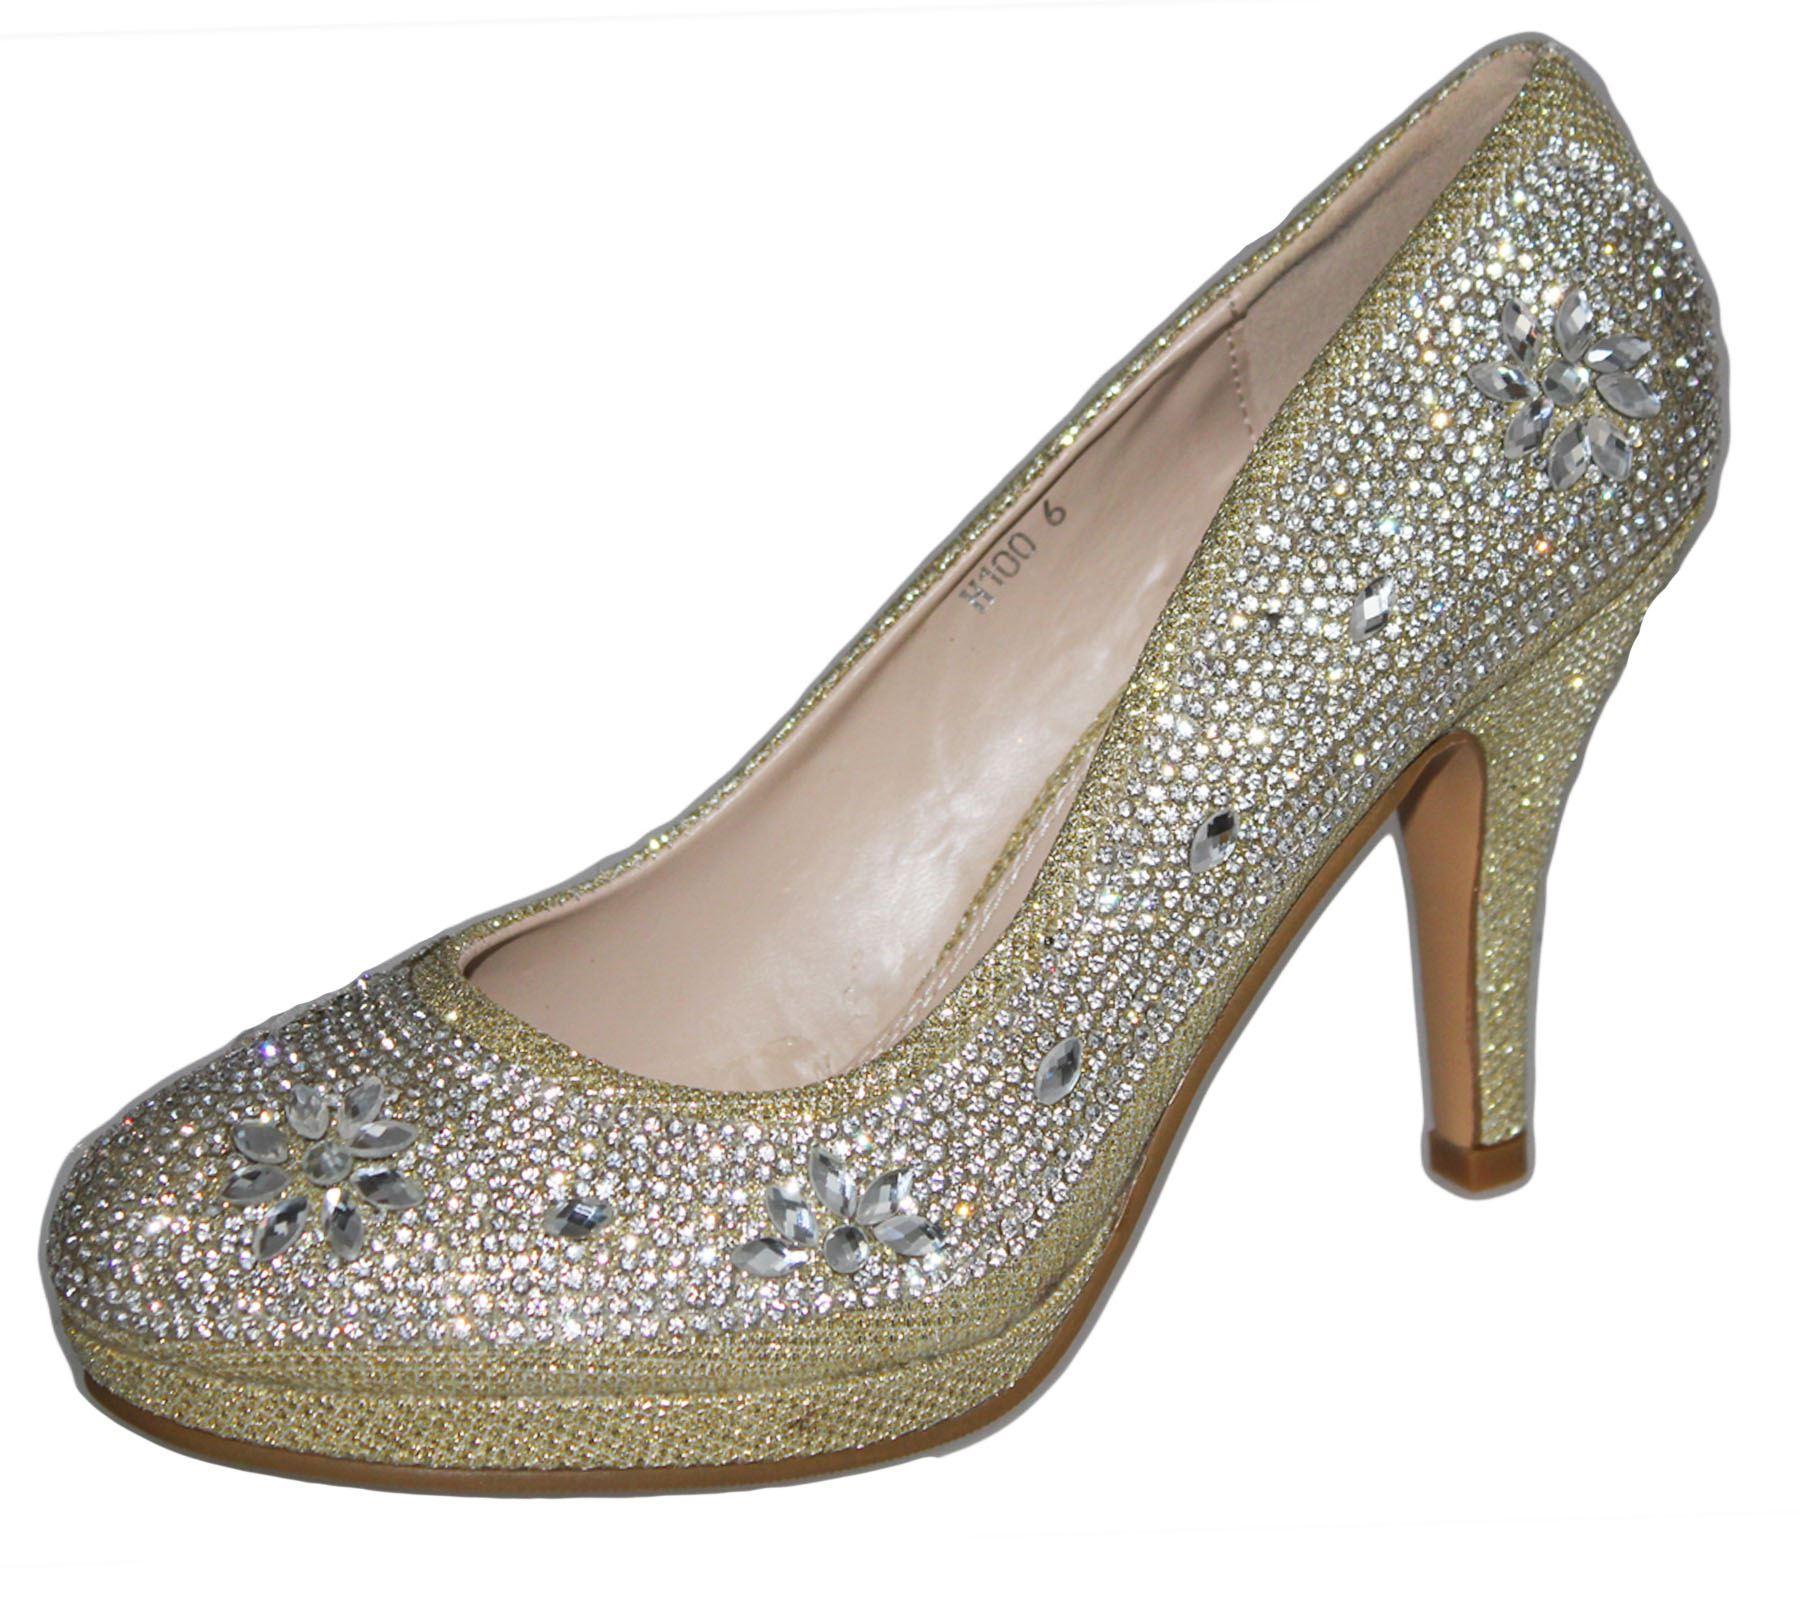 Womens-Platforms-High-Heels-Wedding-Bridal-Evening-Diamante-Ladies-Party-Shoes miniatura 22